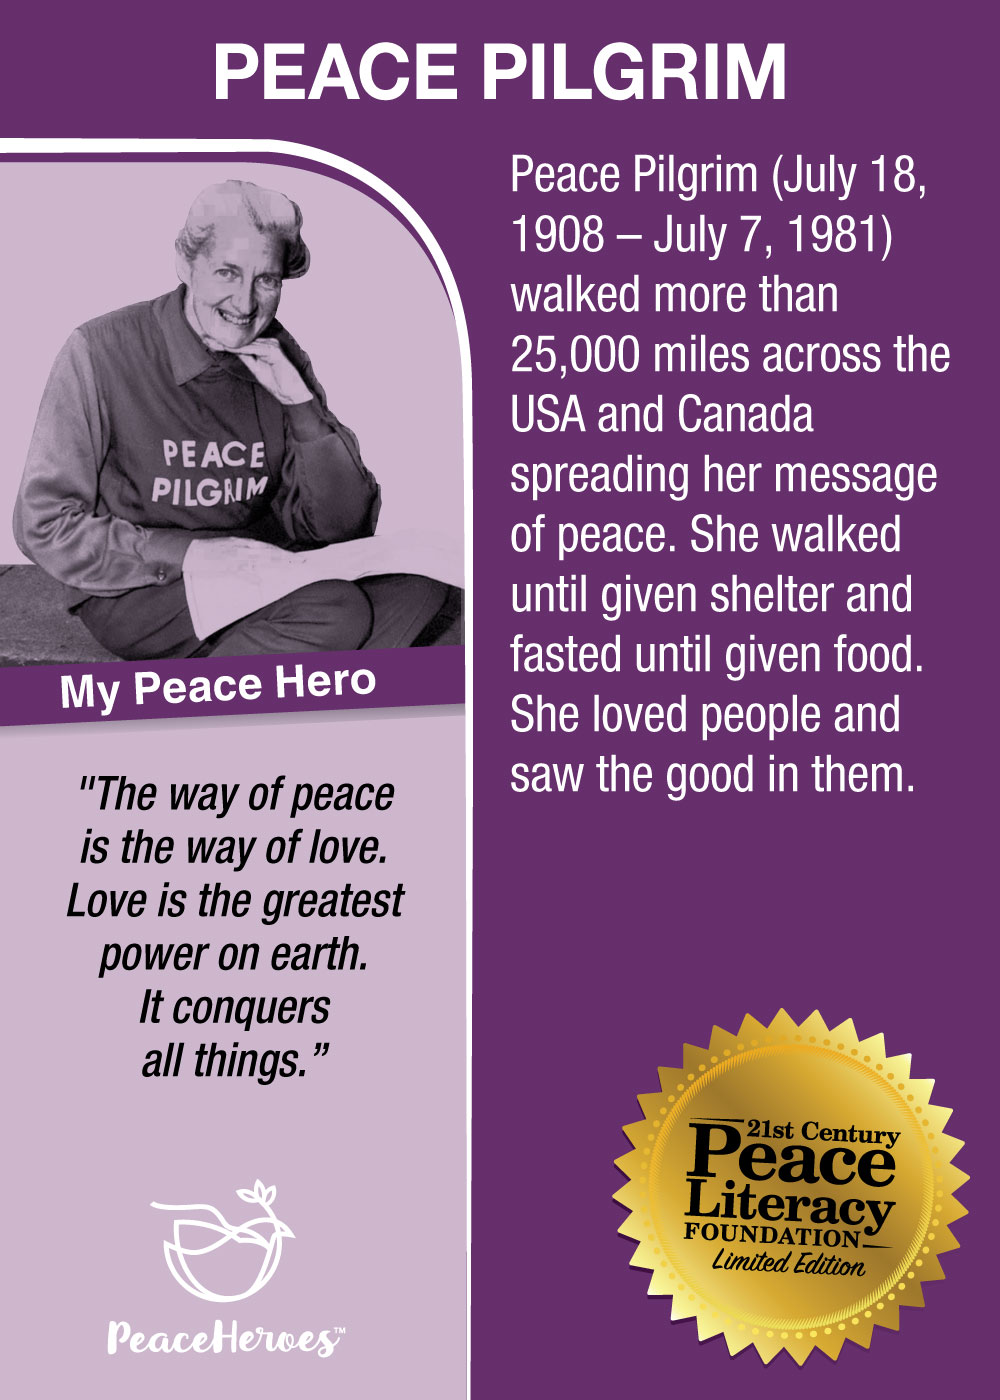 PeacePilgrim.jpg